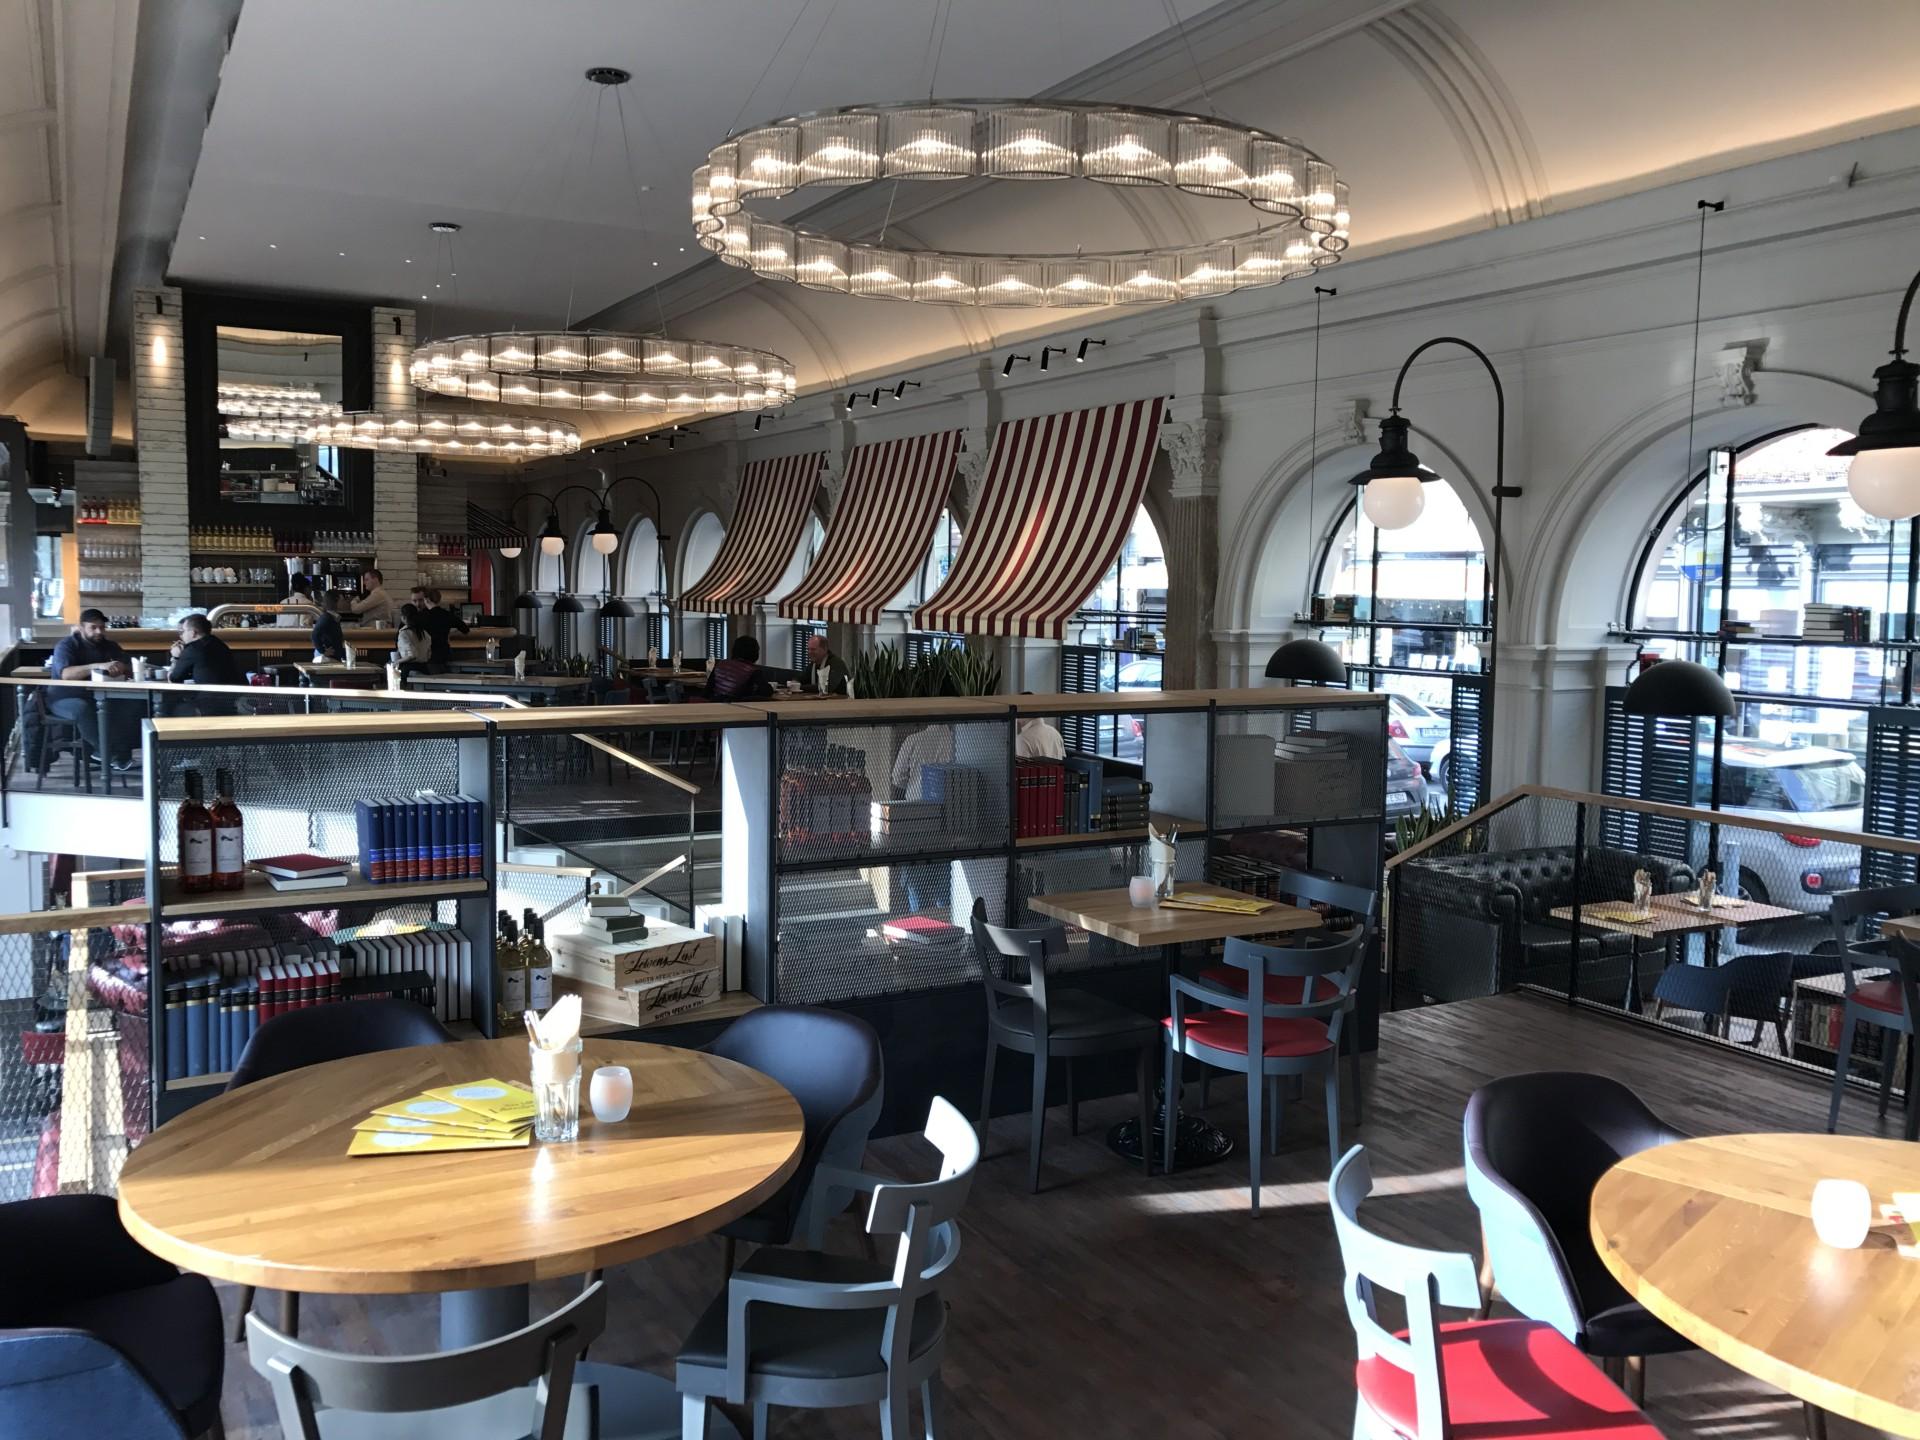 Wiesbaden Cafe